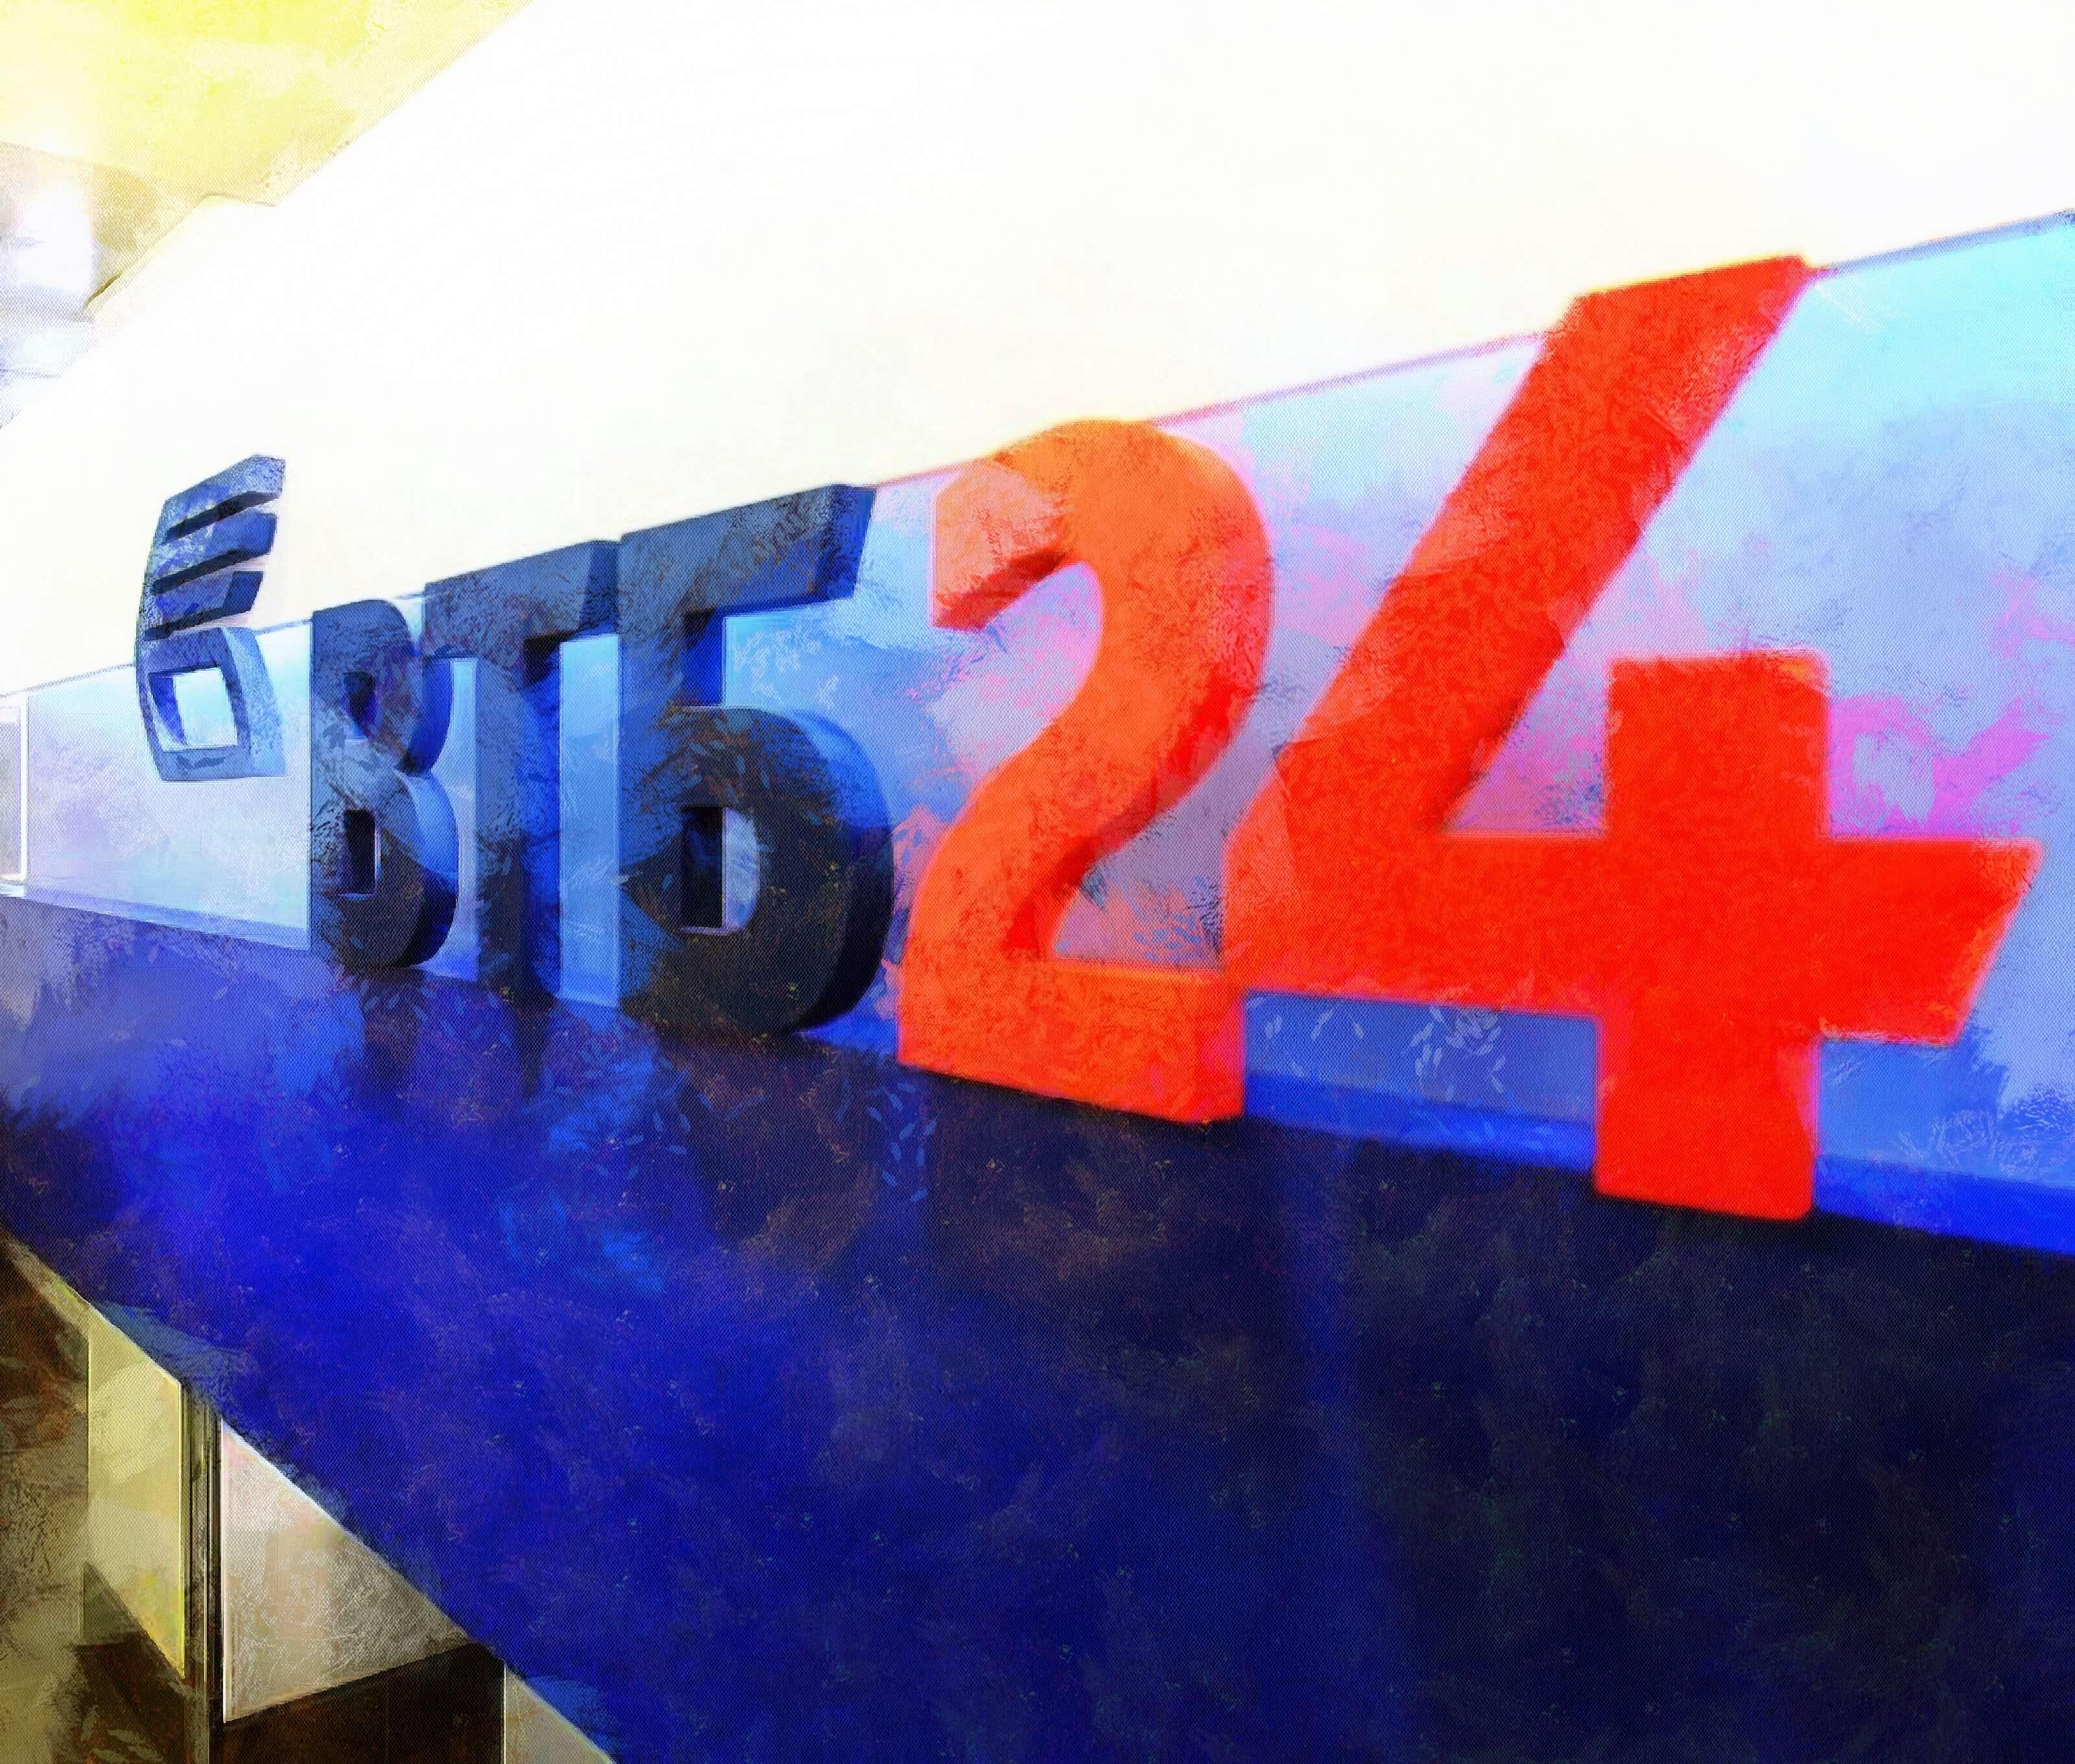 Ипотека по двум документам в ВТБ24, условия и расчёт